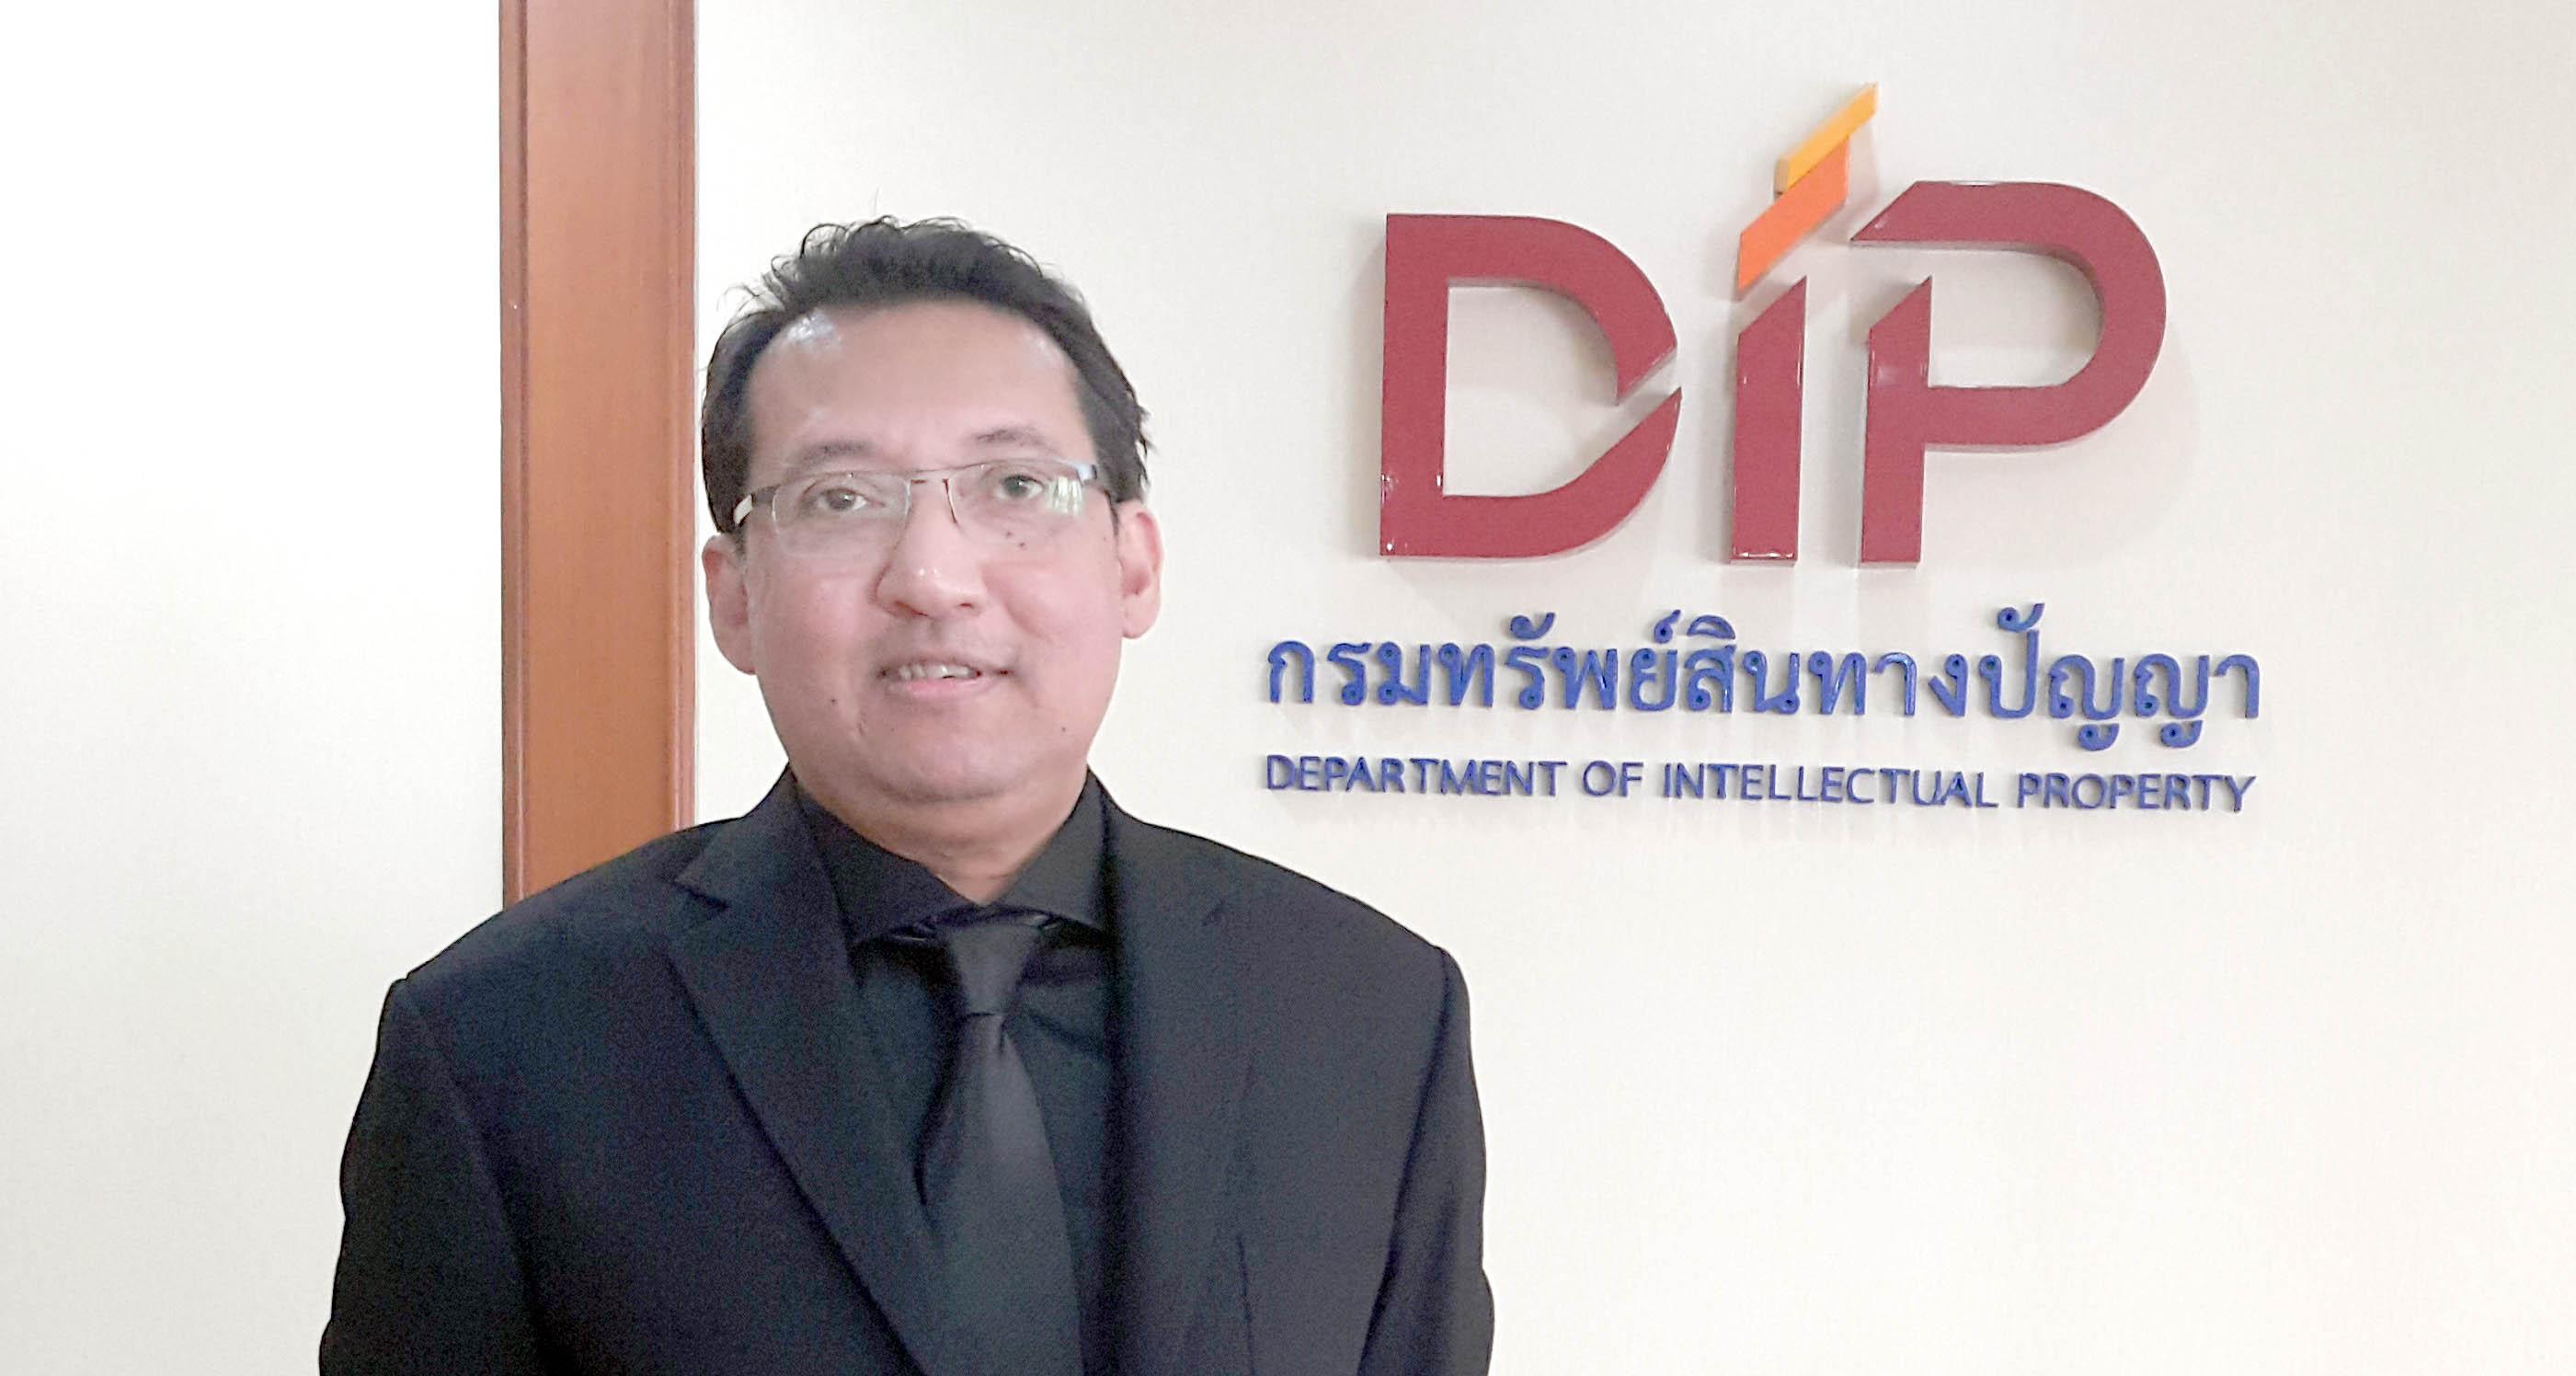 Thailand News - 21-04-17 4 NNT Lots of counterfeit goods seized in March 1jpg